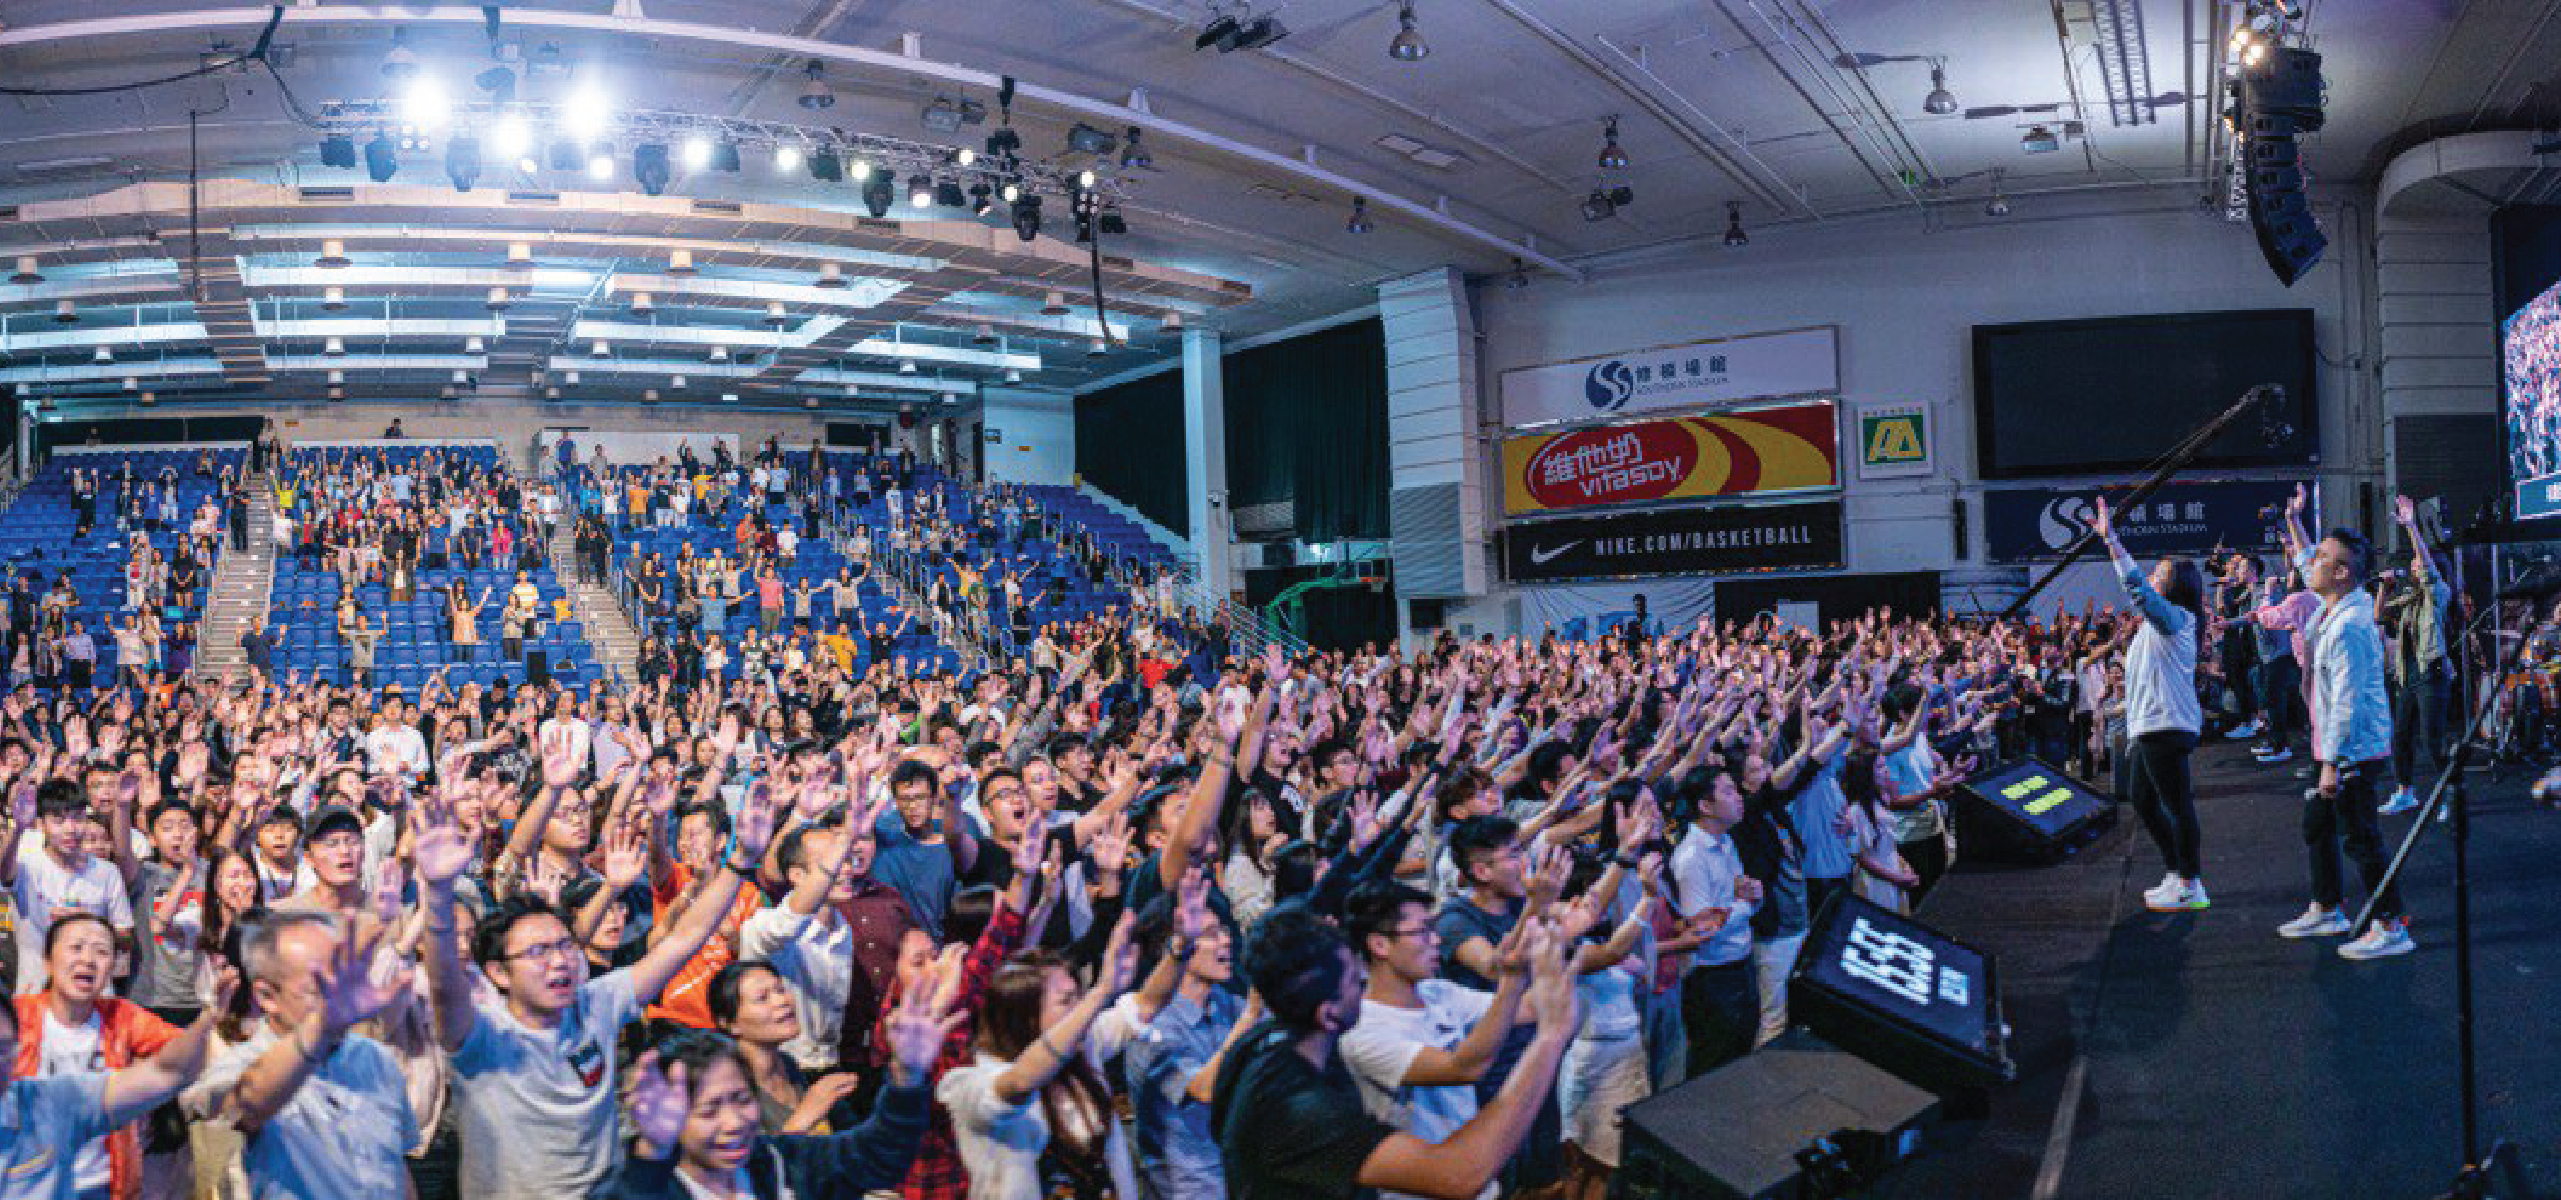 DAY 2 RECAP: STRONG CHURCH CONFERENCE HONG KONG